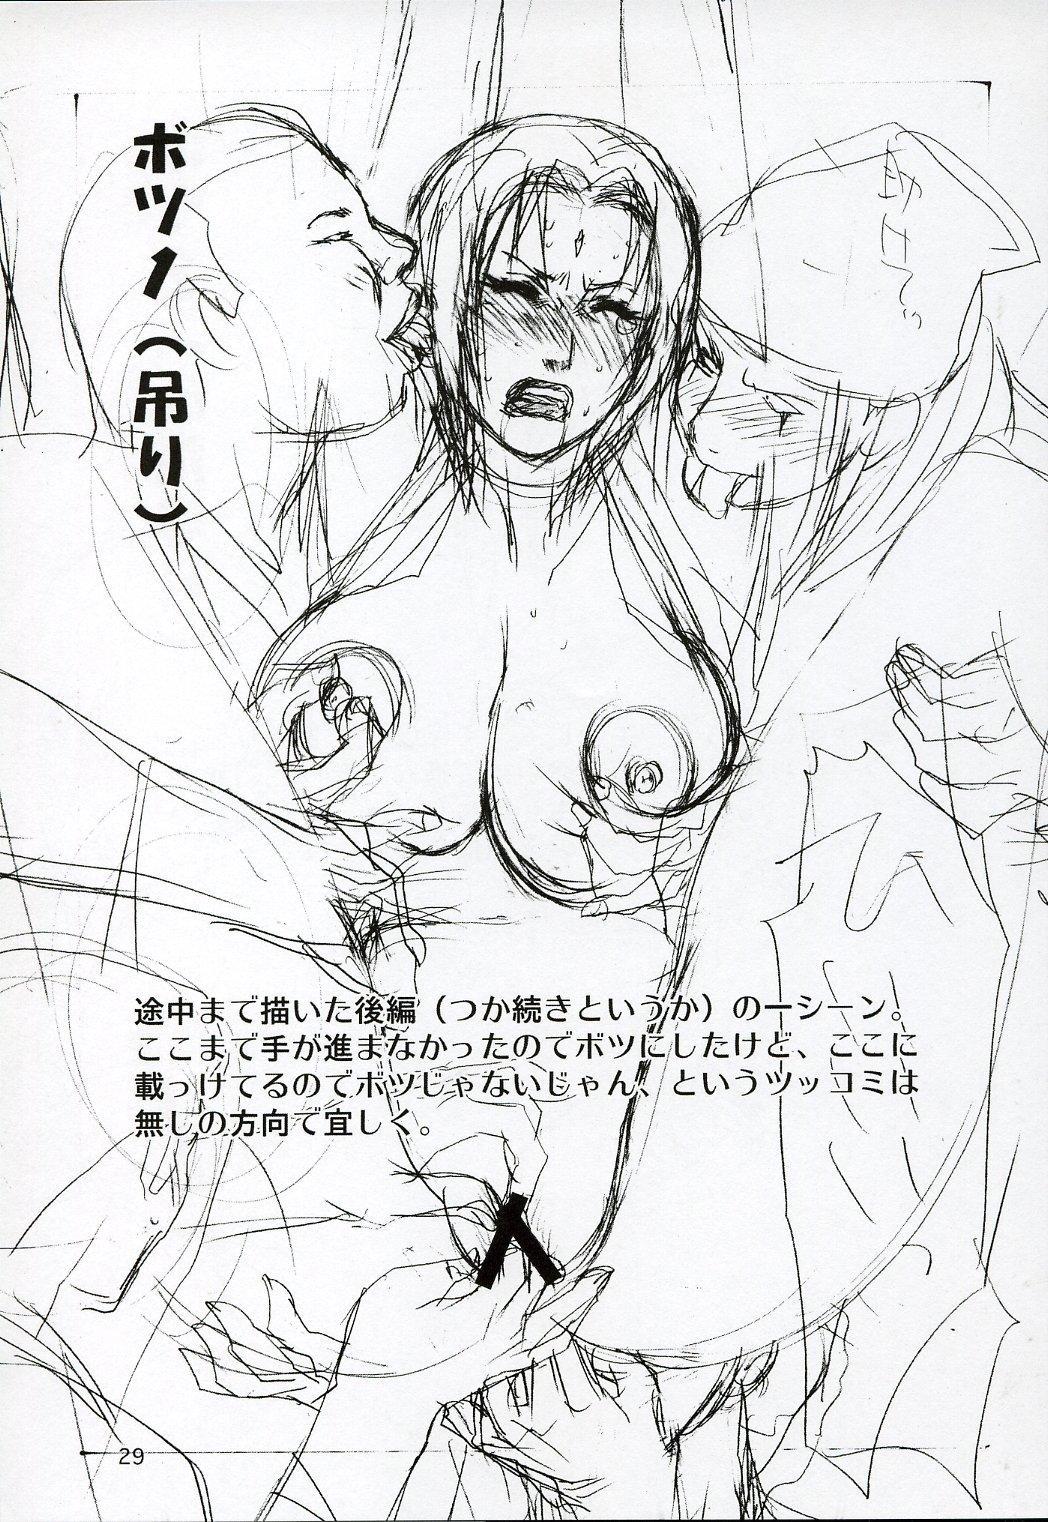 Adesugata Shiro Buta Hime   The Alluring White Pig Princess 27